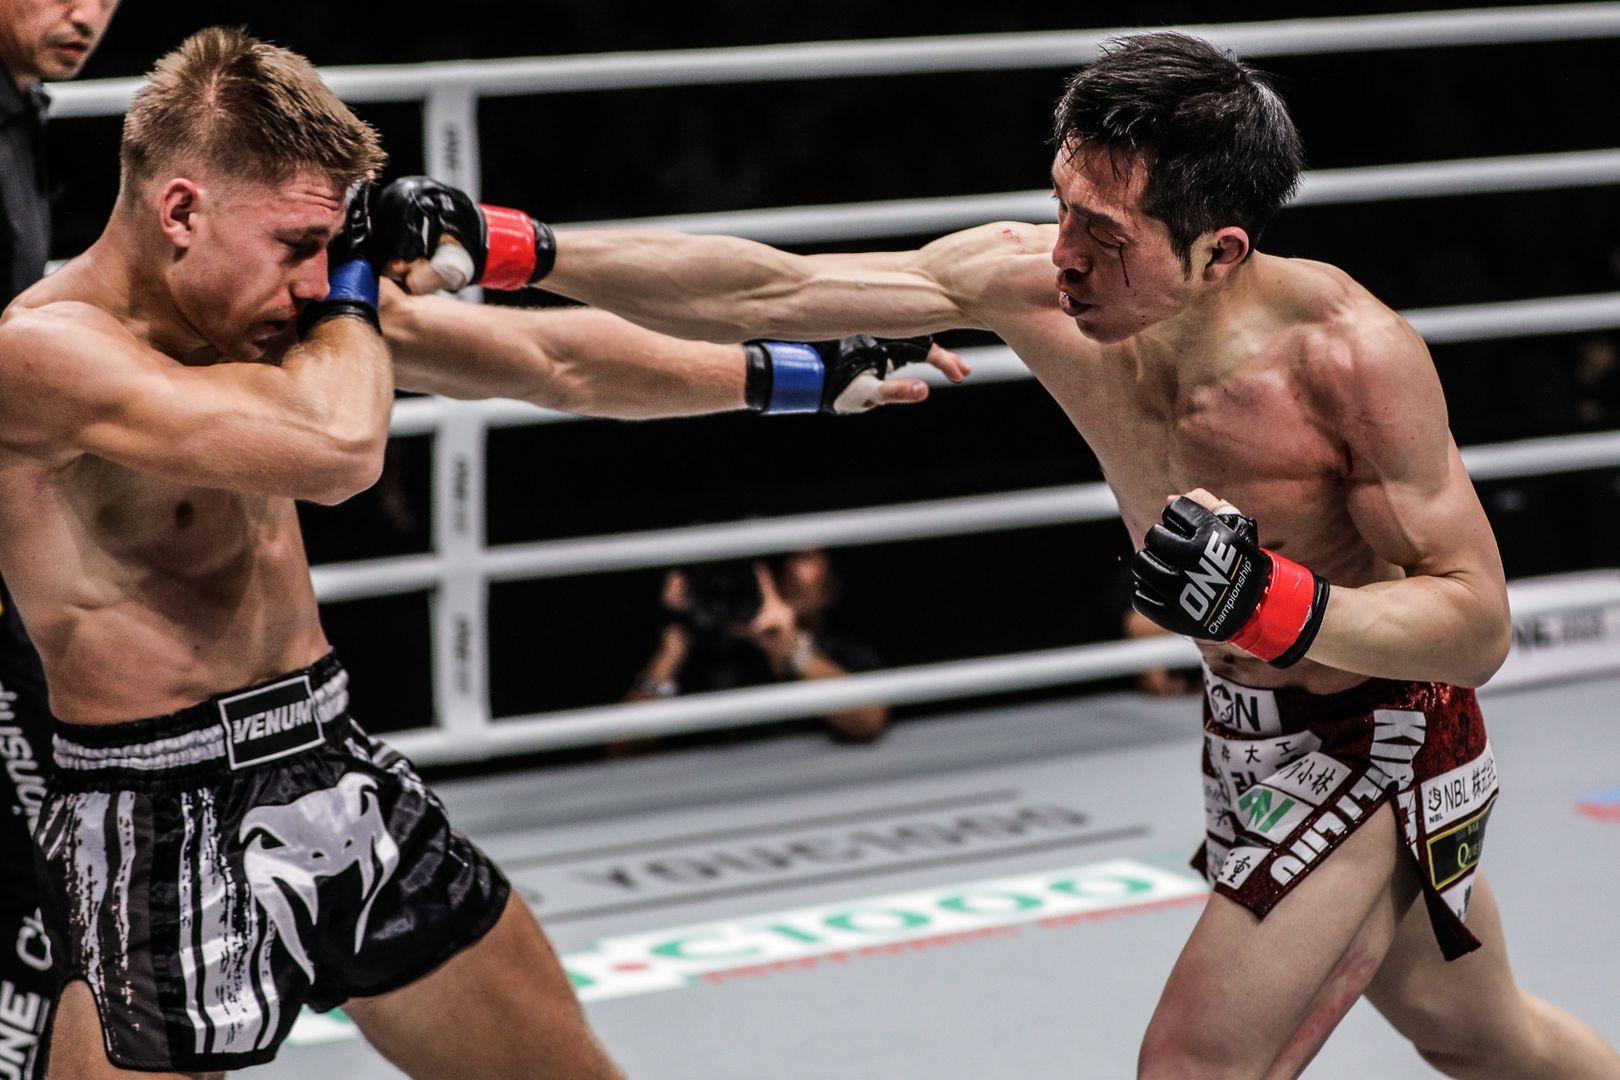 Kenta Yamada defeats Deividas Danyla in a Muay Thai match by split decision at ONE: FOR HONOR